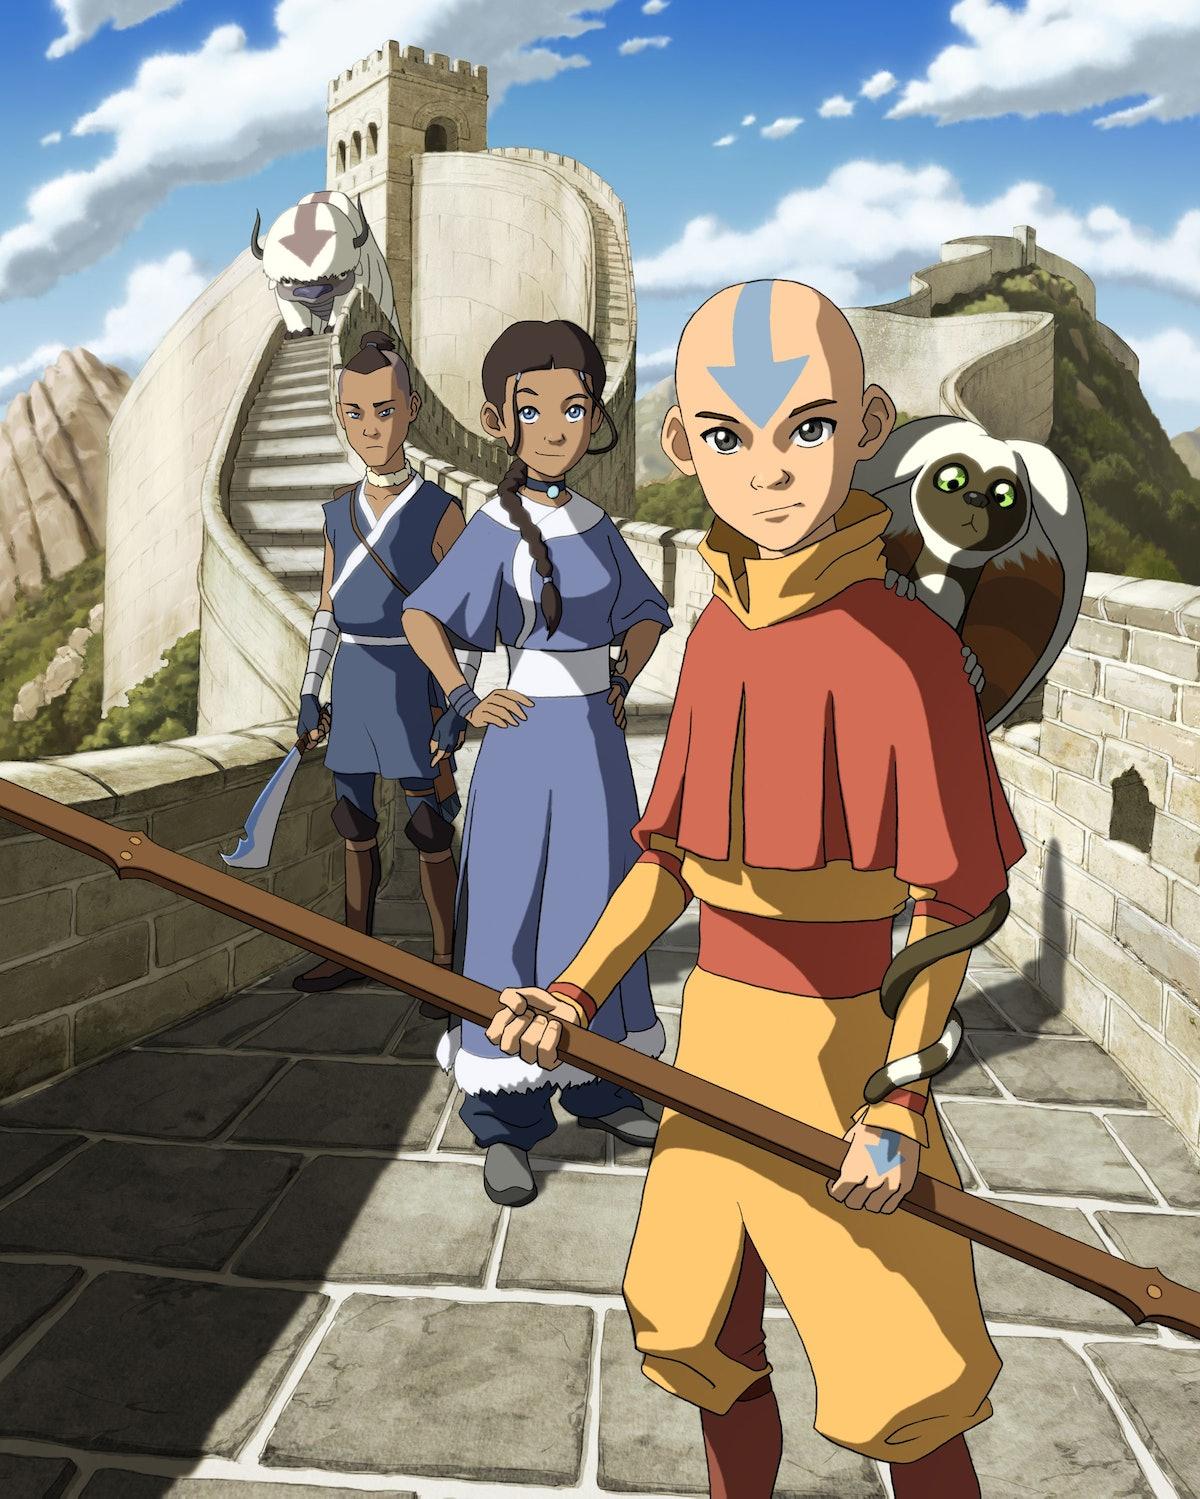 Photo Still Of Nickelodeon Series Avatar The Last Air Bender